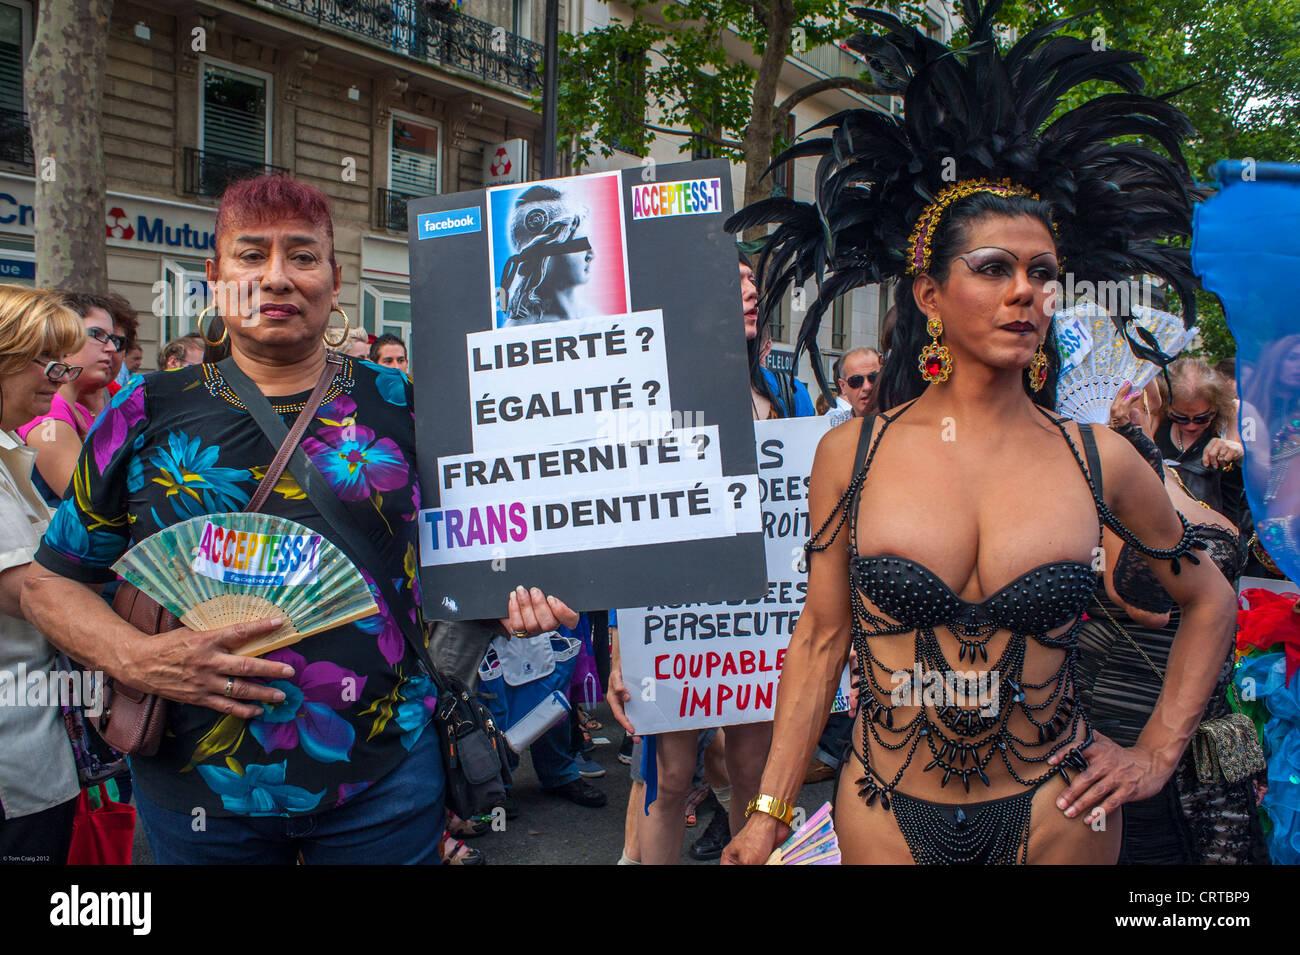 Paris gay sexe BBW grosses filles porno